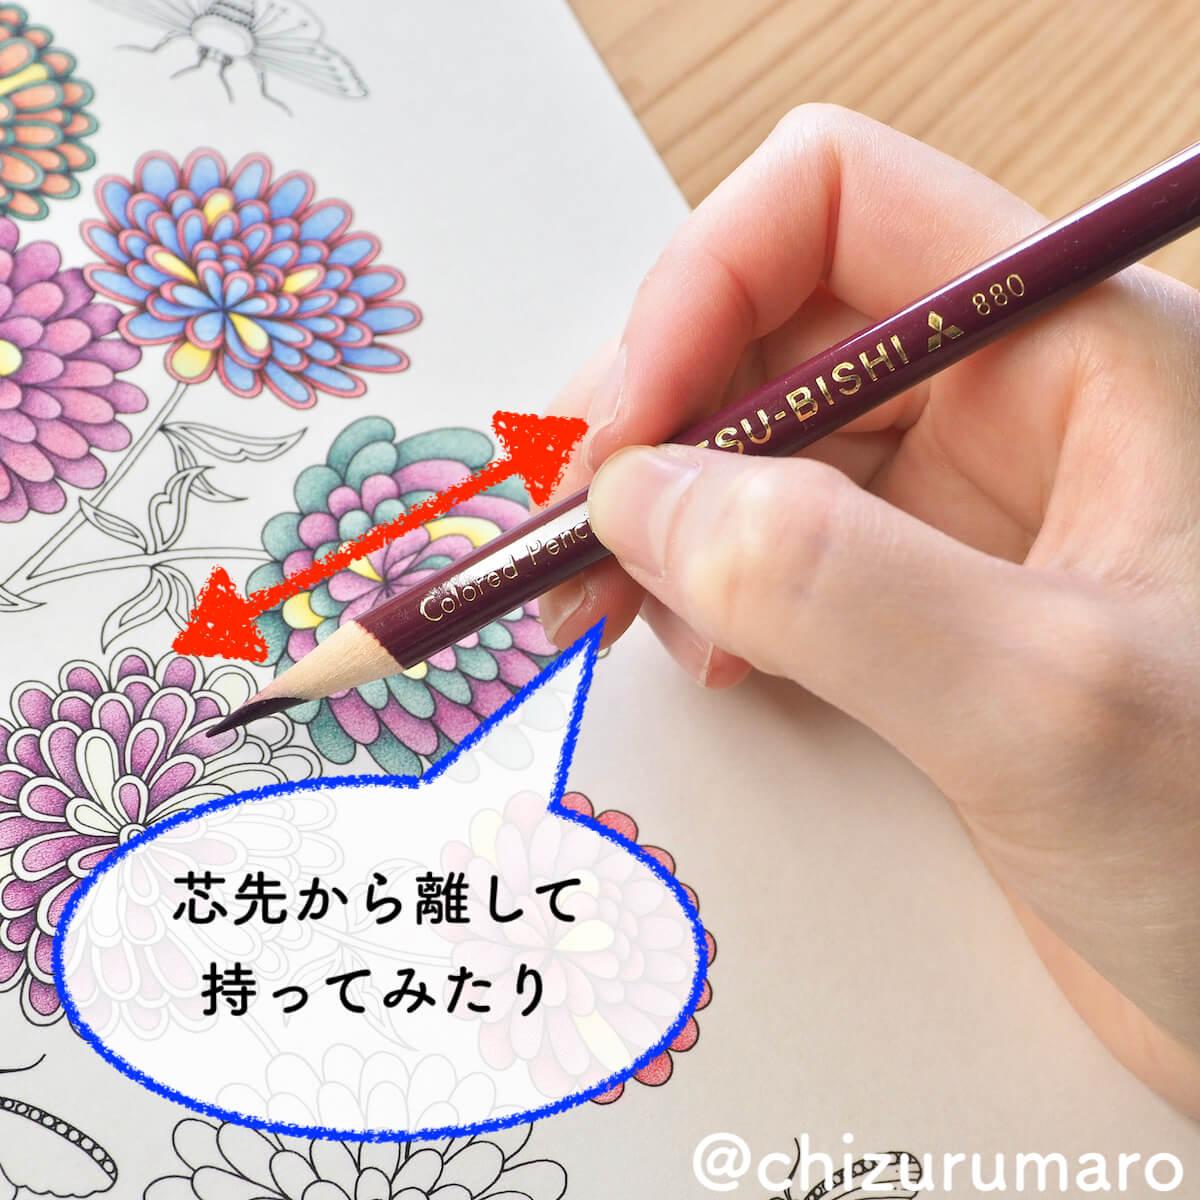 f:id:chizurumaro:20200422152937j:plain